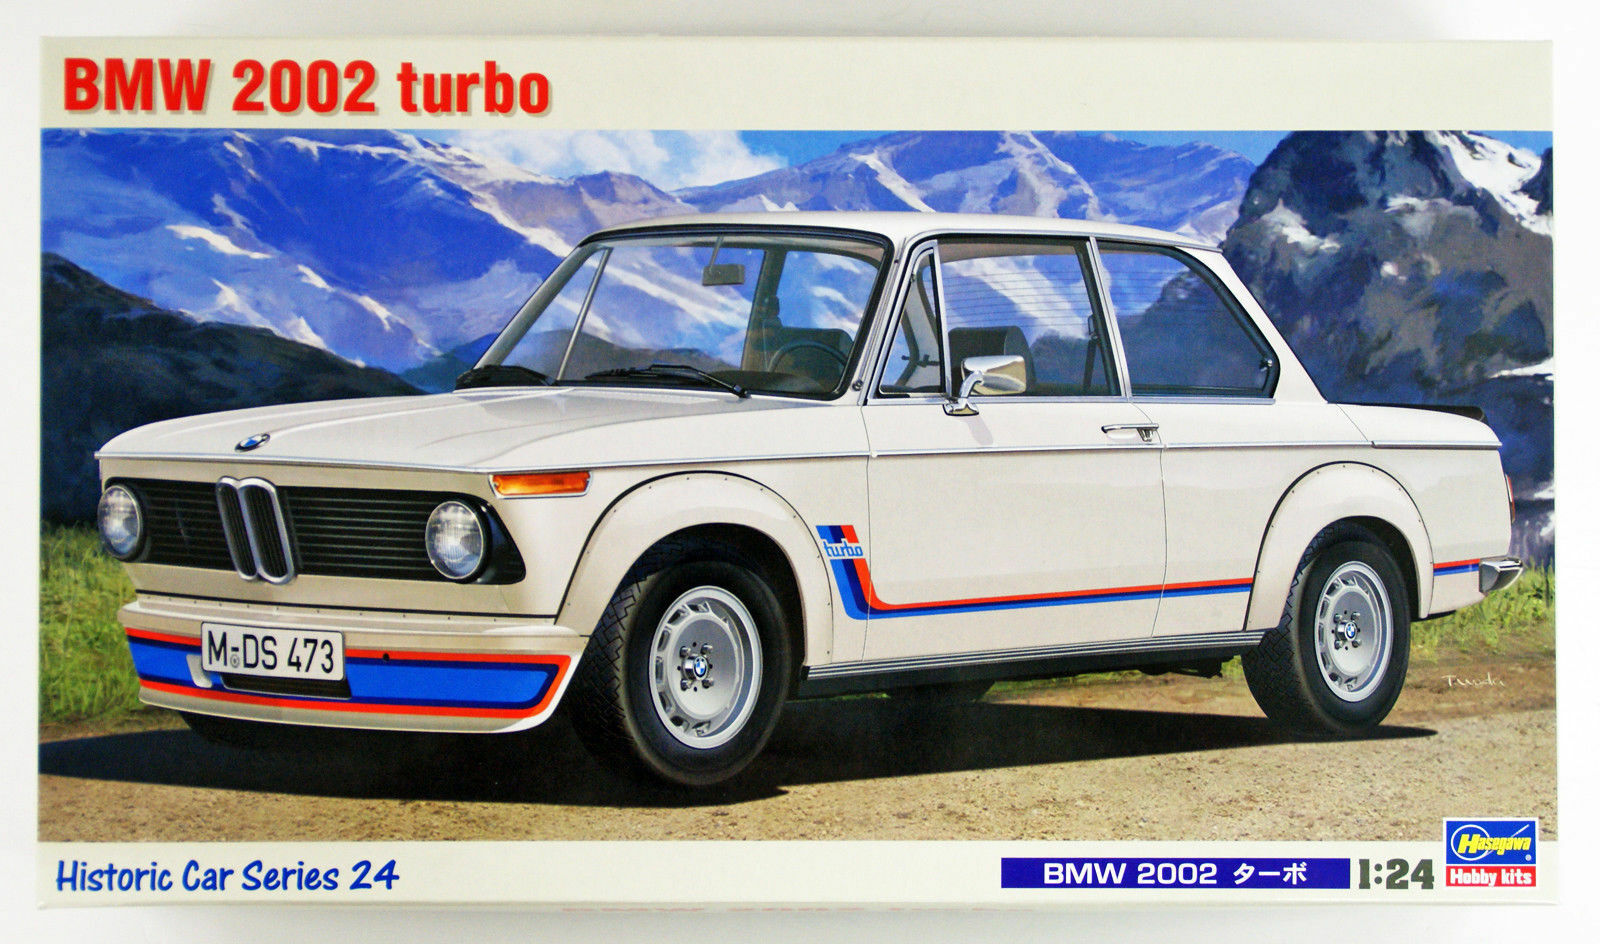 Hasegawa HC-24 BMW 2002 Turbo 1 24 Scale Kit